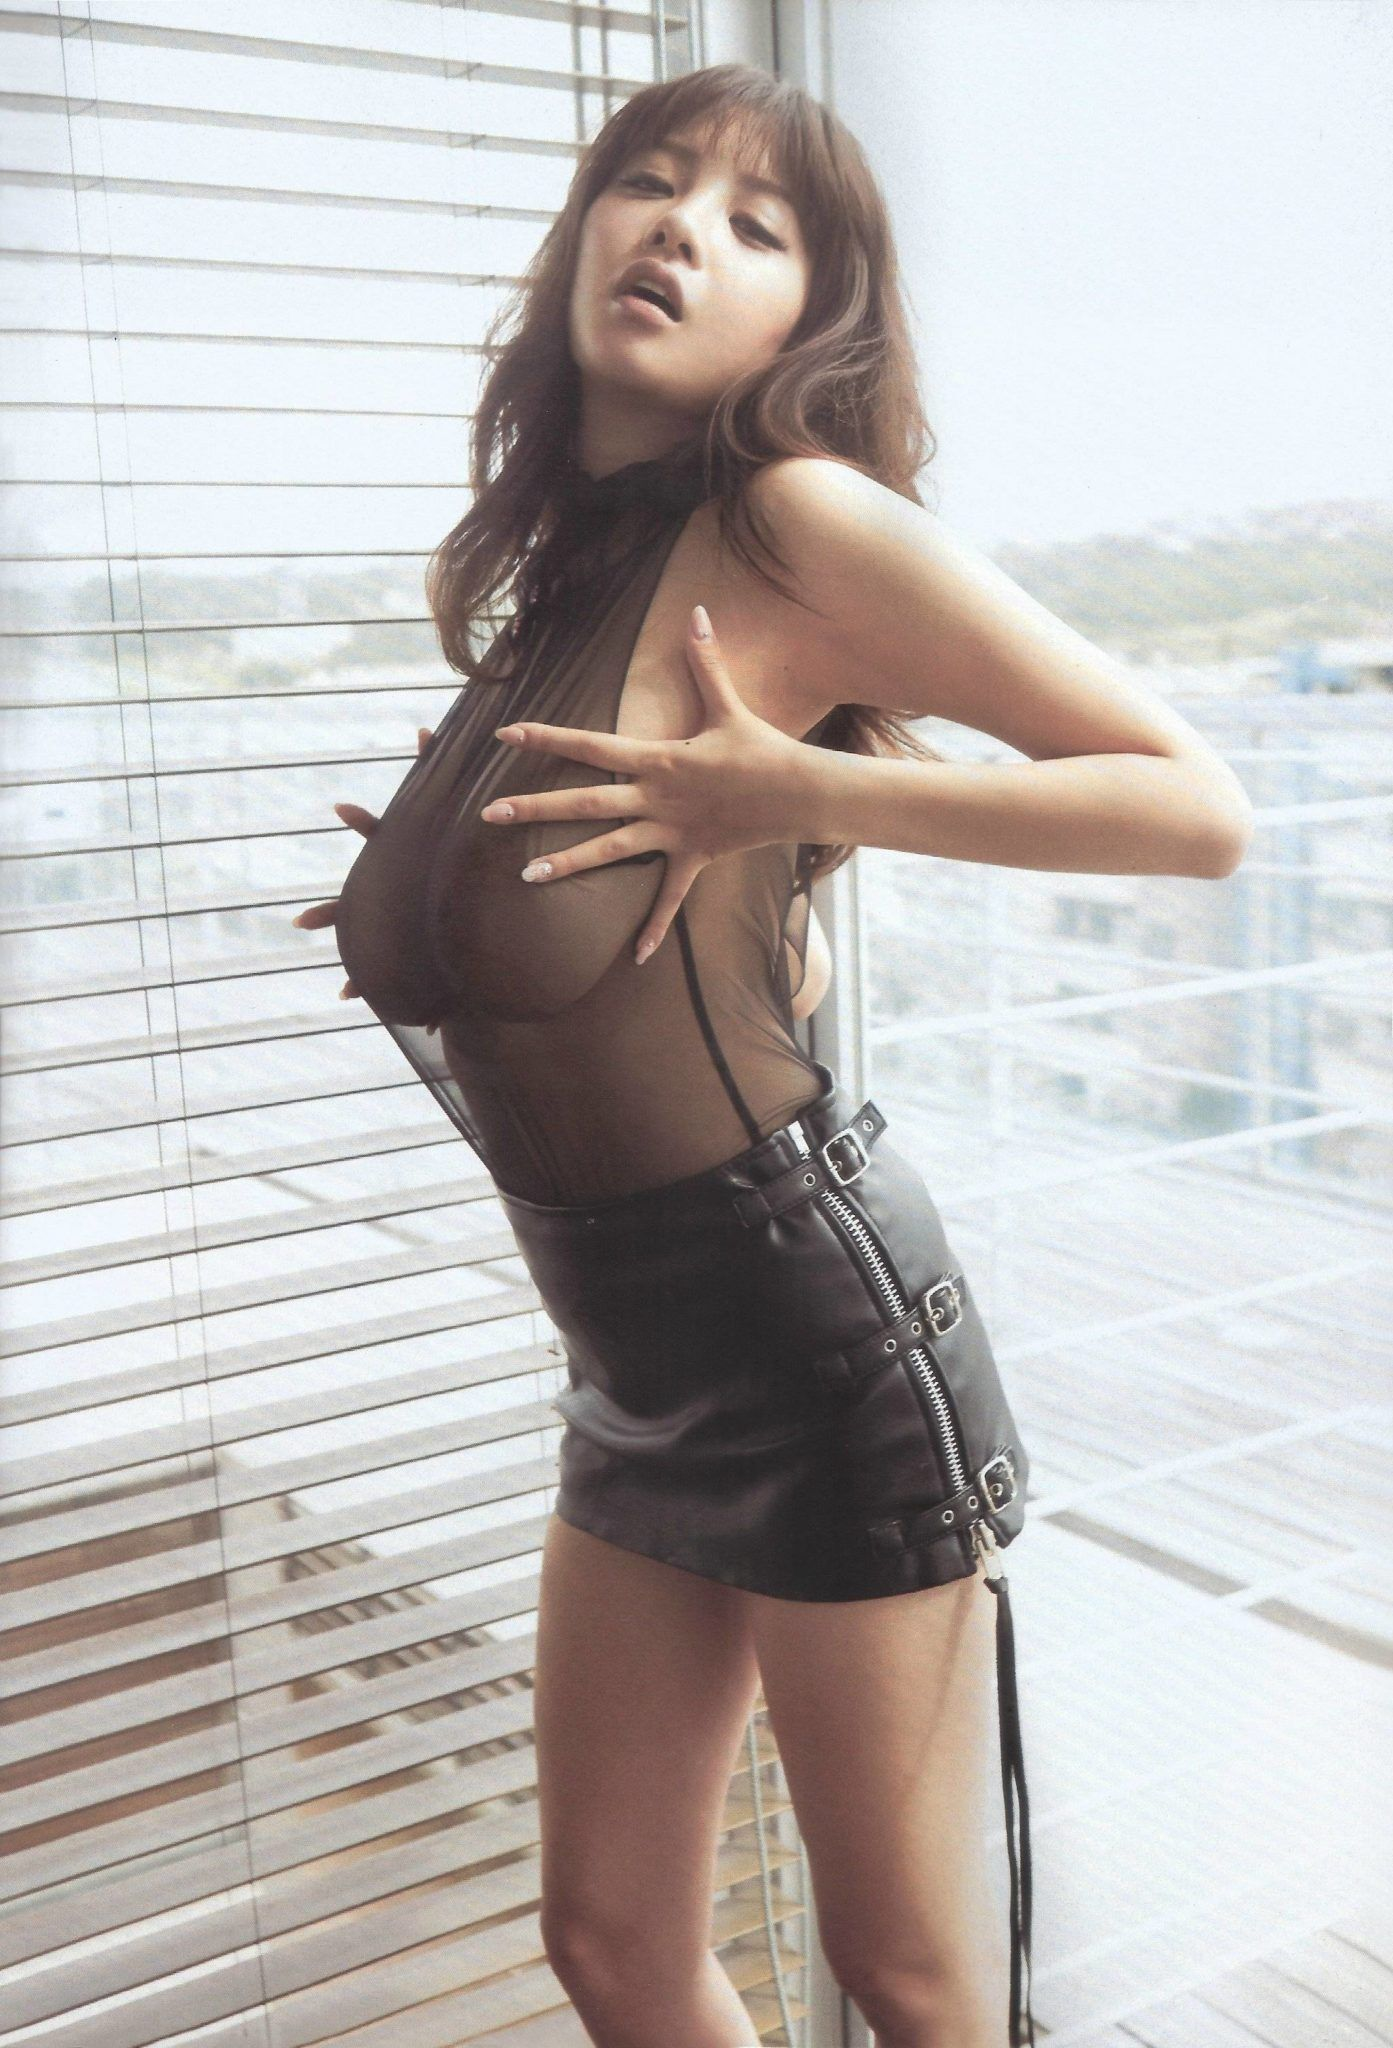 nude (75 photo), Instagram Celebrity pictures